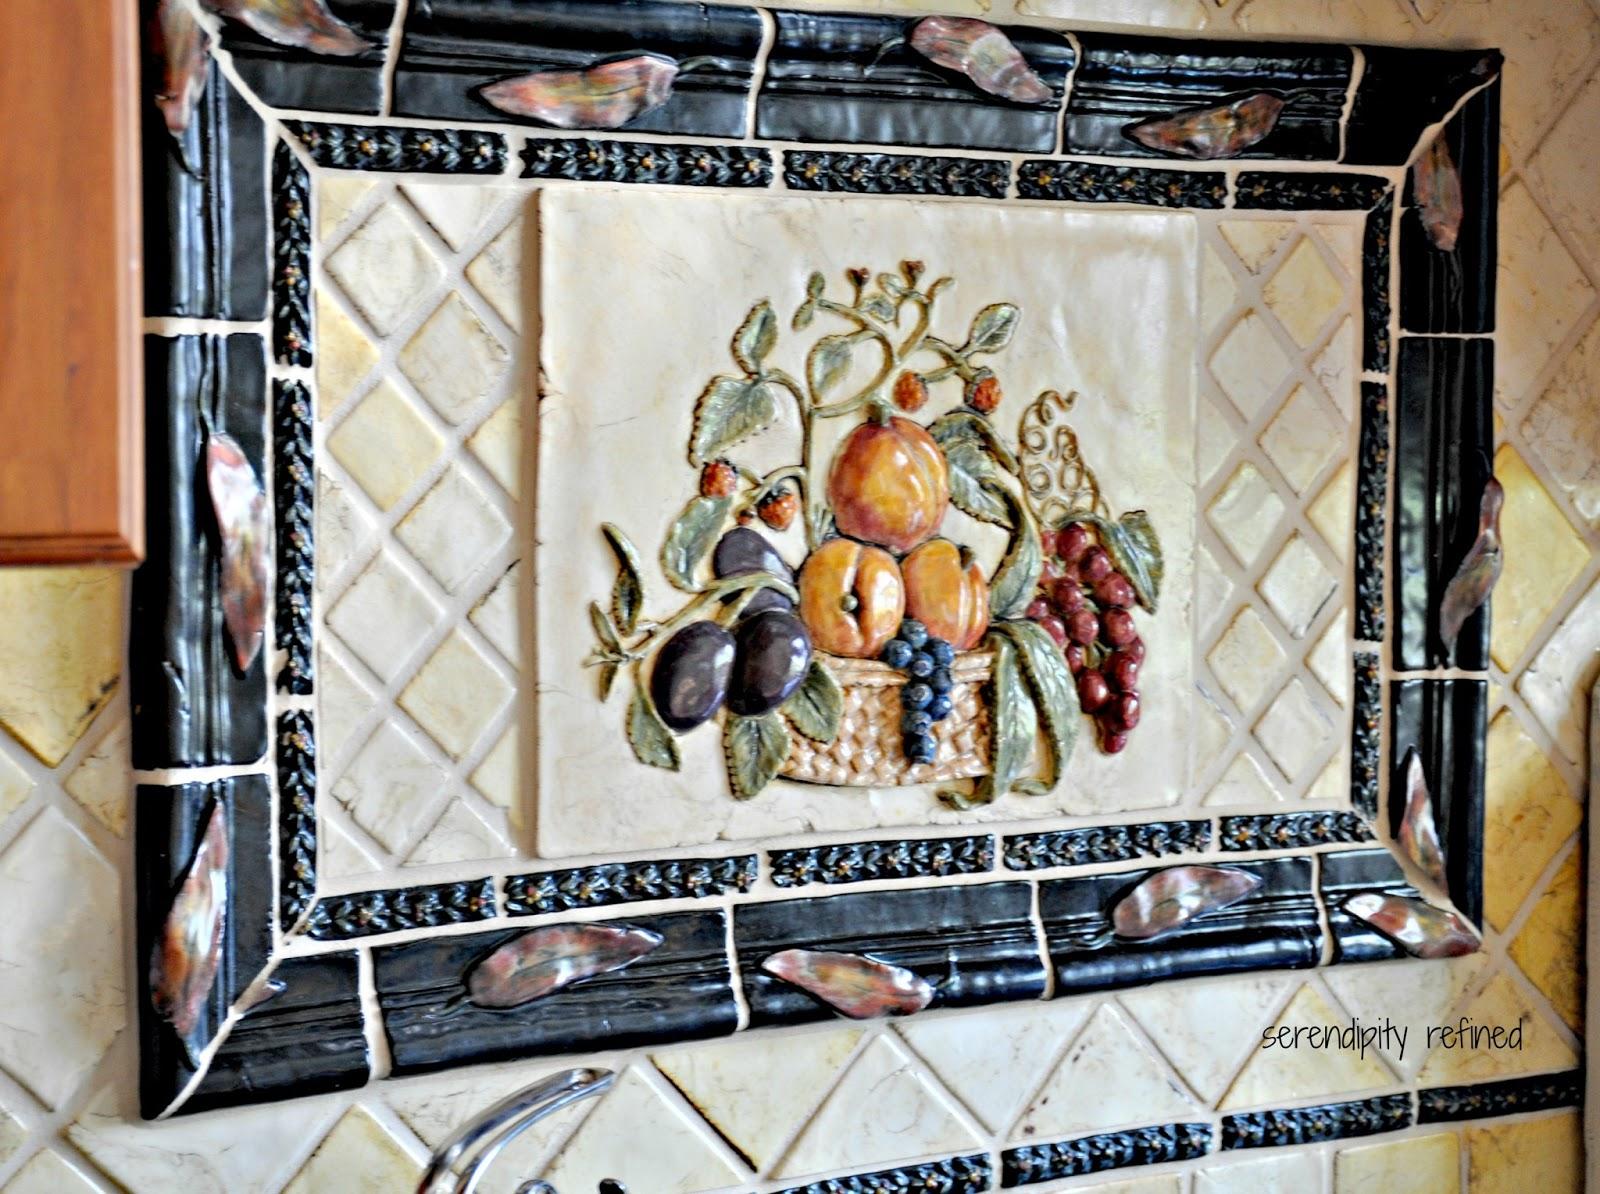 Ceramic Tile Murals For Kitchen Backsplash Serendipity Refined Blog My Kitchen Back Splash Hand